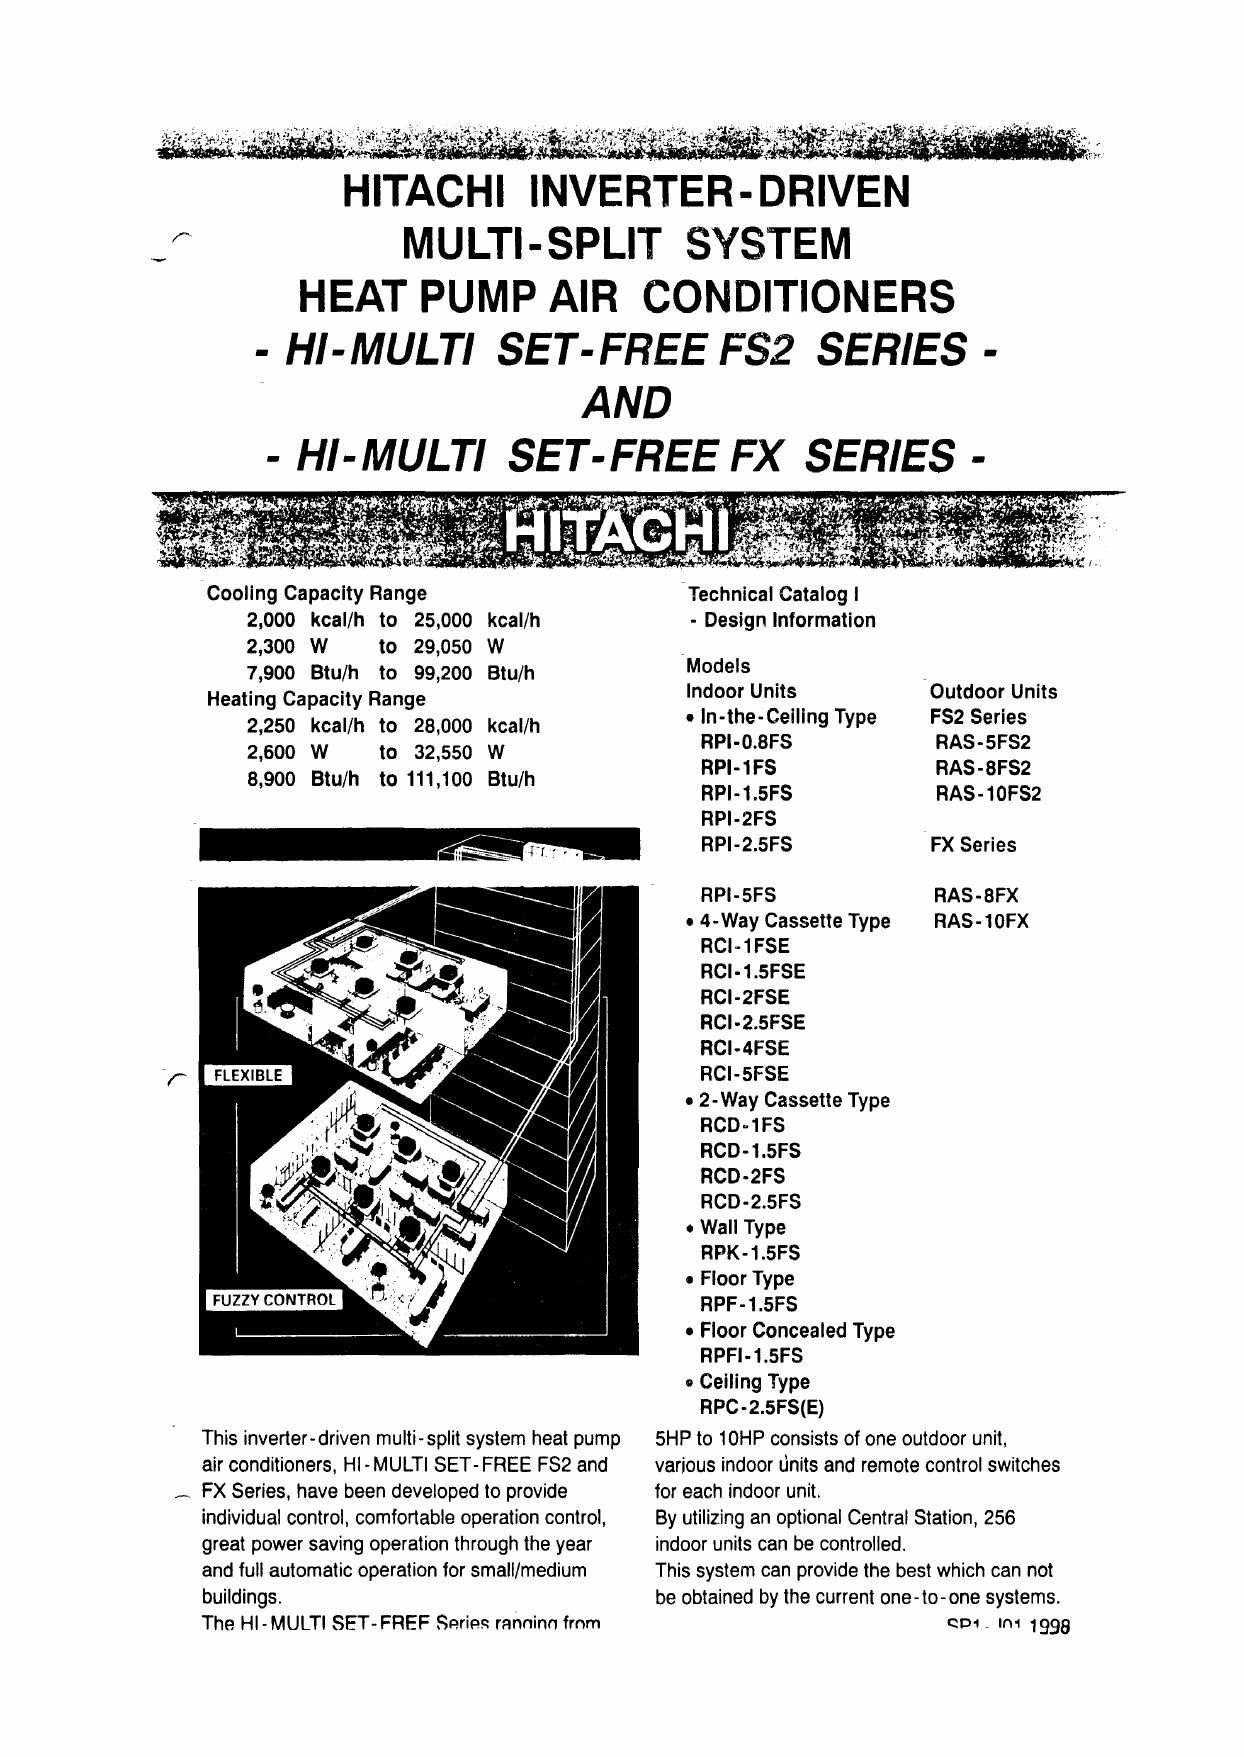 hitachi inverter-driven multi-split system heat pump air